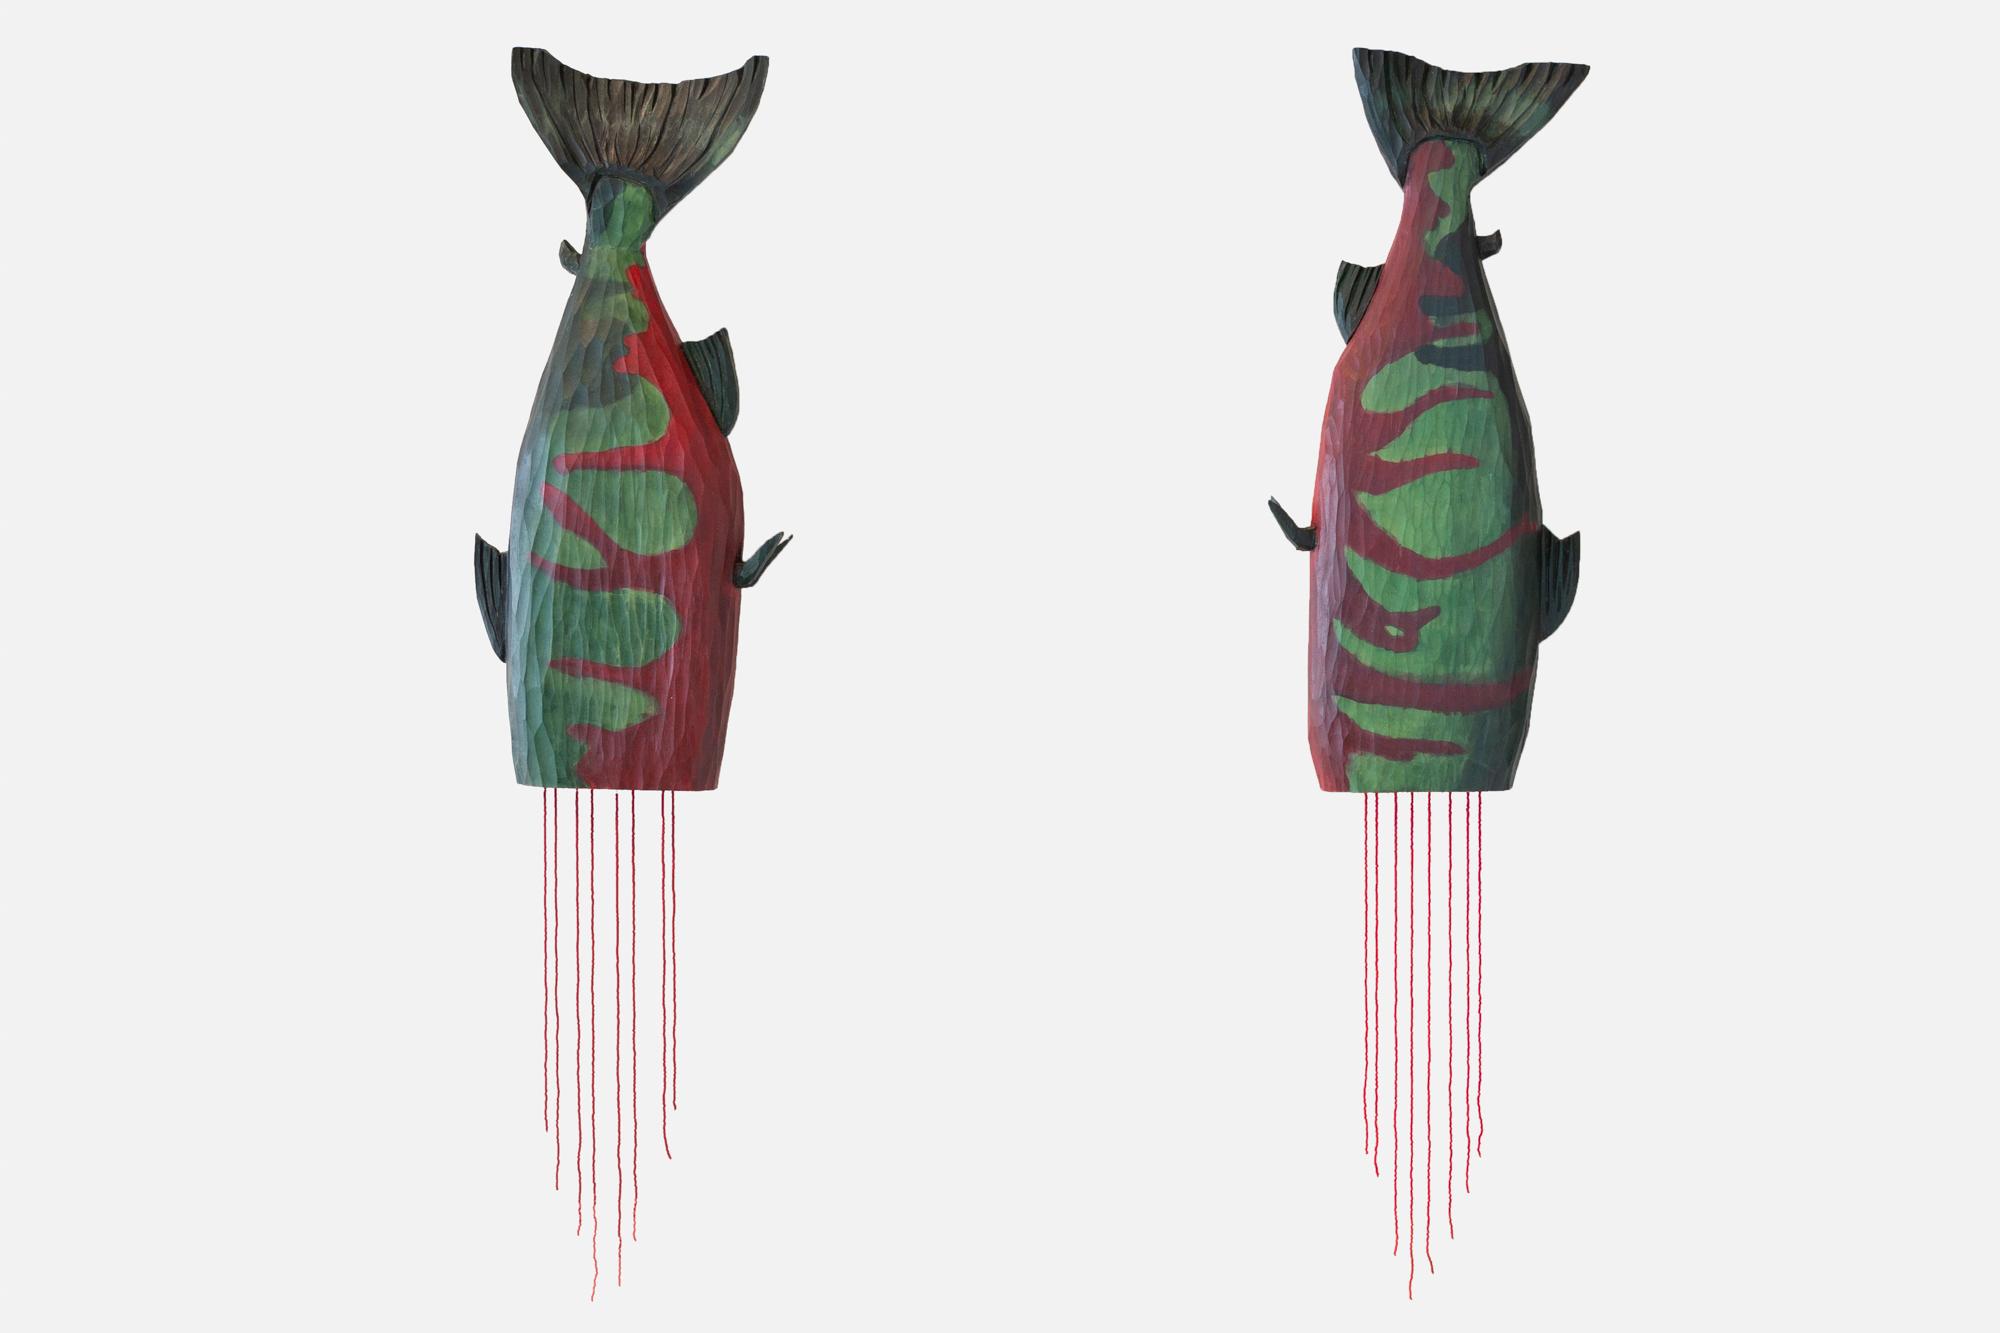 lqalugrauaq 1 & 2